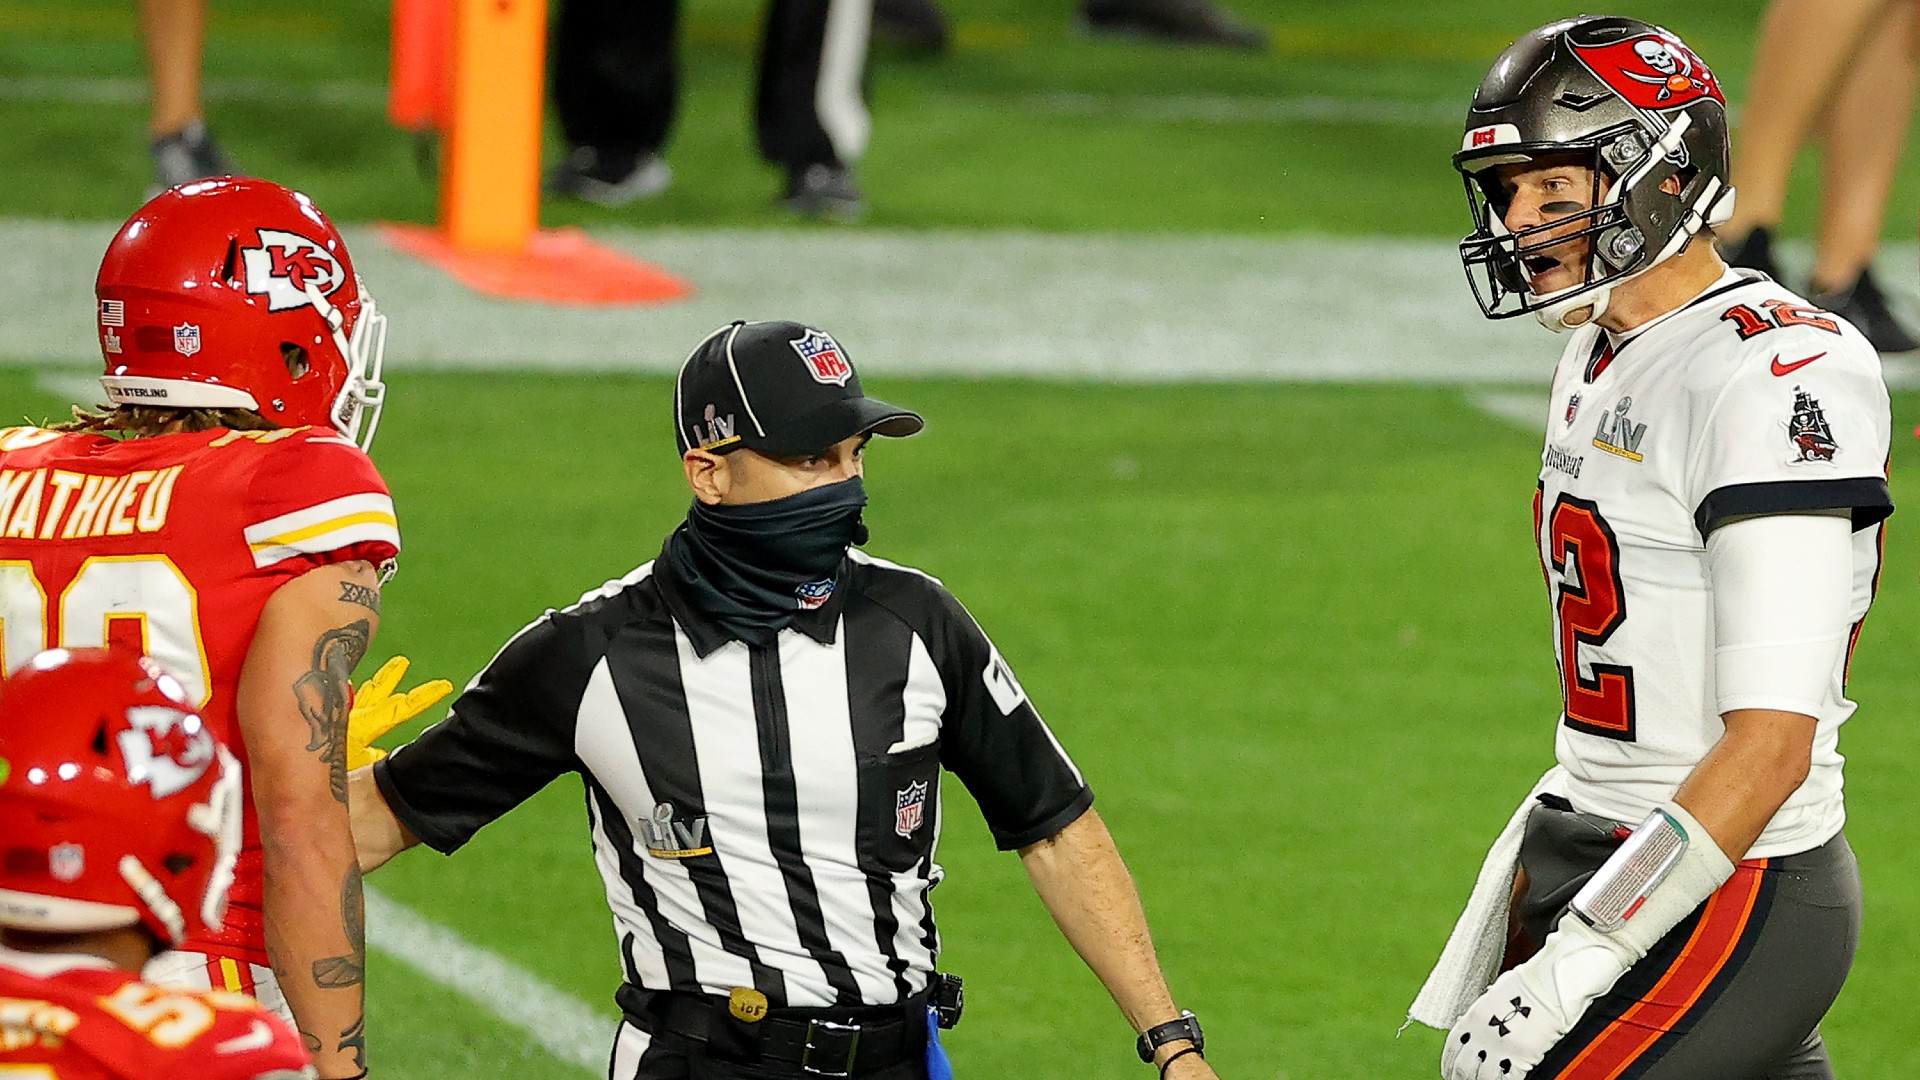 Michael Irvin says Super Bowl 55 audio shows Tom Brady didn't call Tyrann Mathieu racial slur